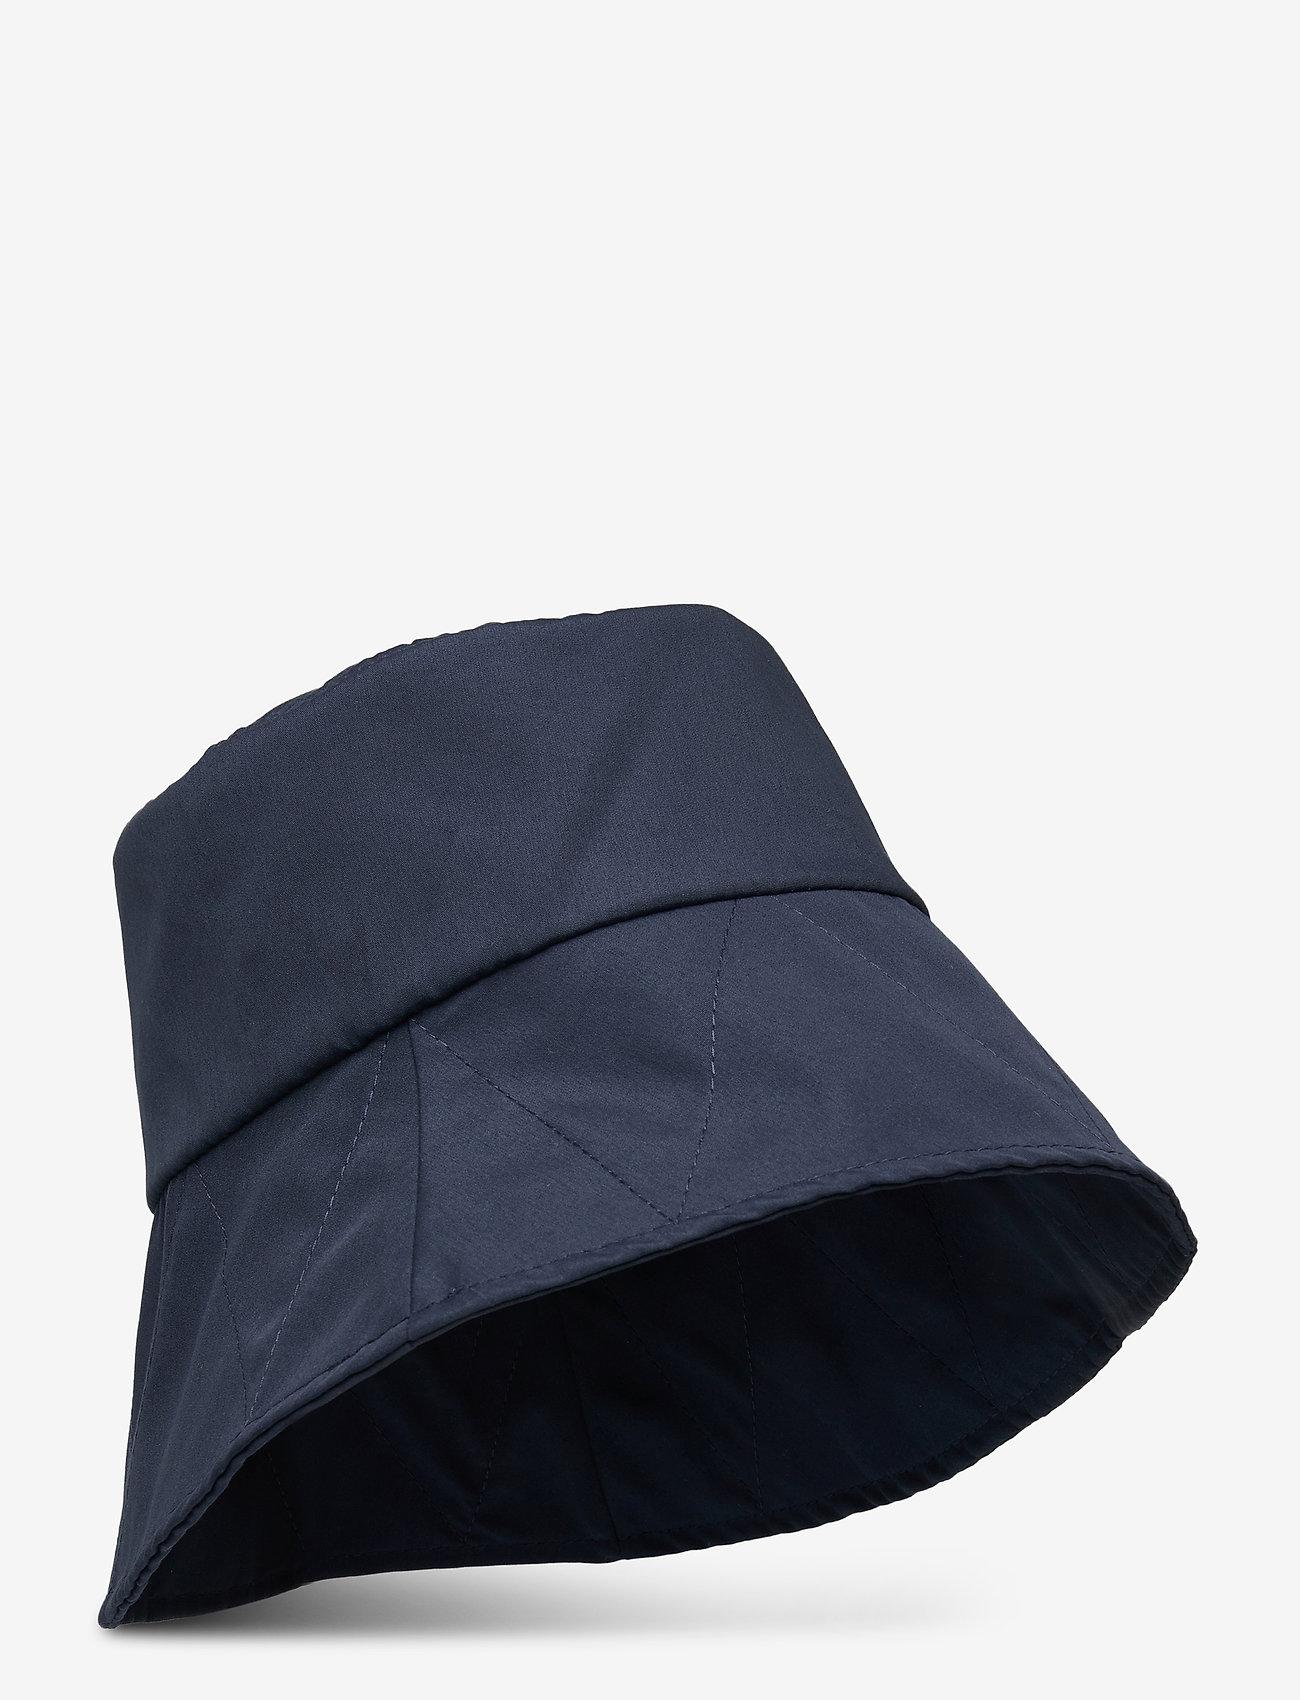 Wood Wood - Sun hat - emmer hoeden - navy - 0